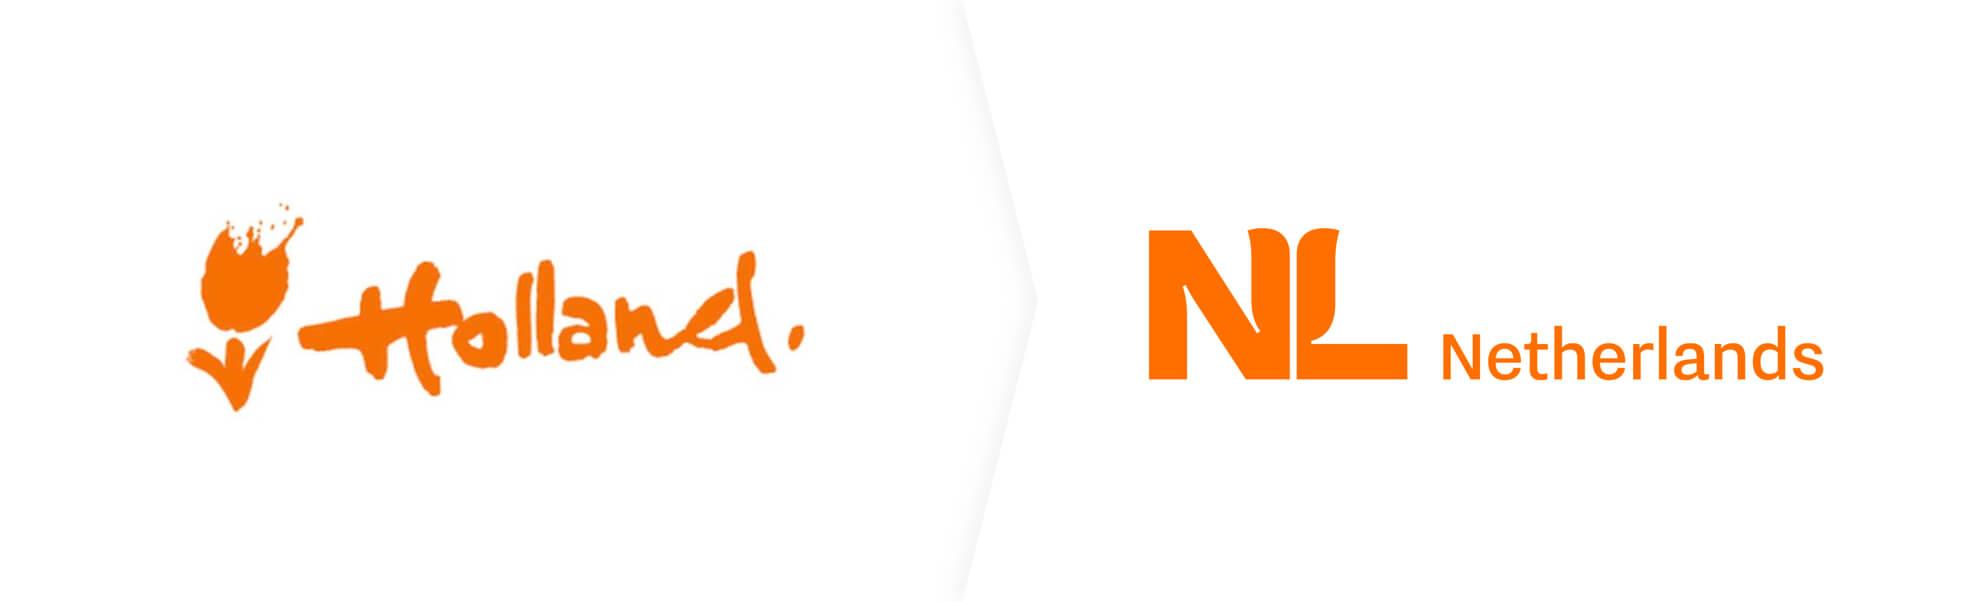 stare i nowe logo Holandii